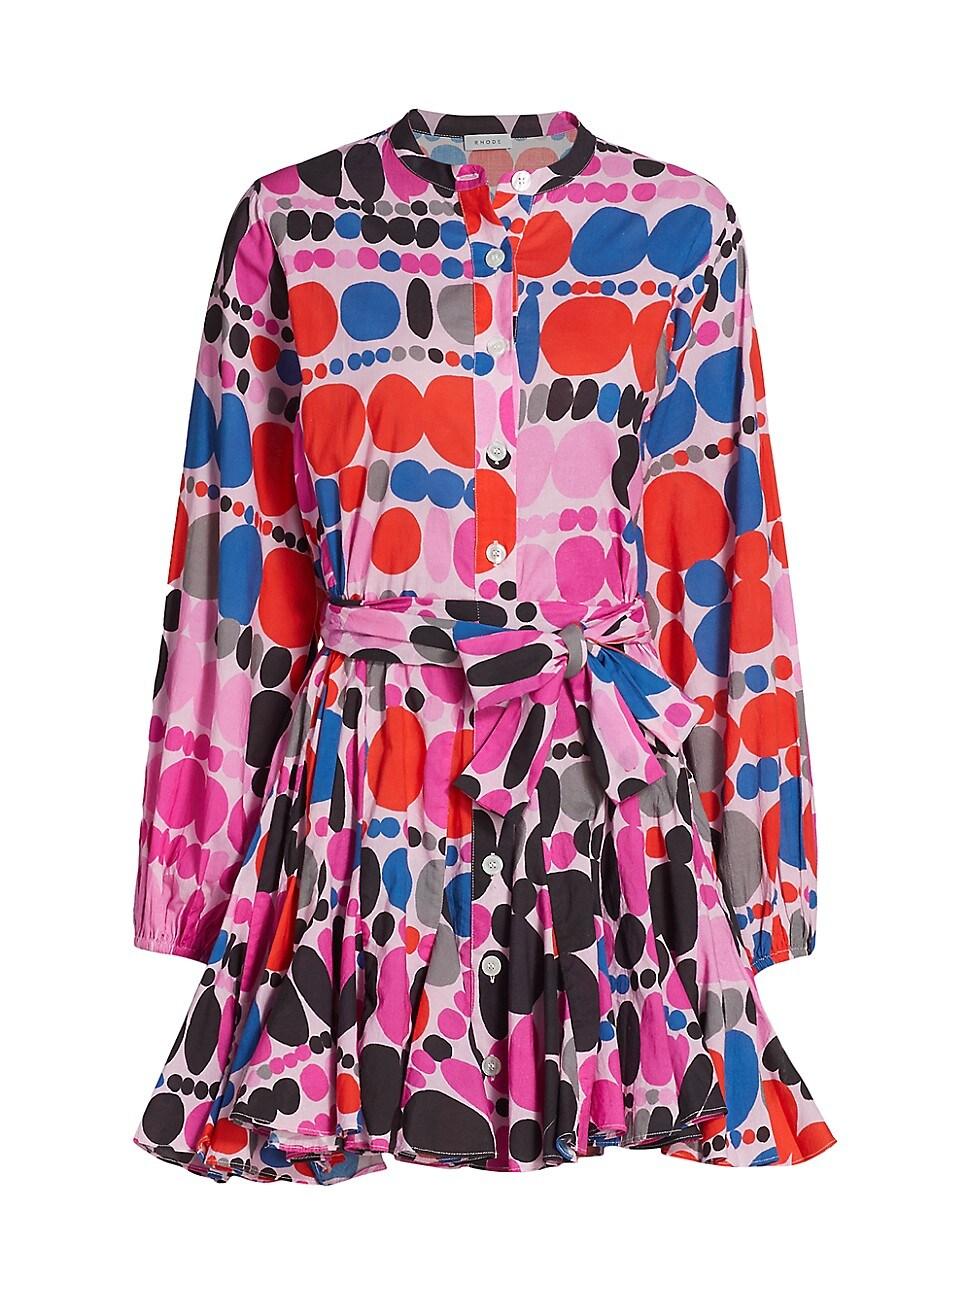 Rhode WOMEN'S EMMA GEOMETRIC PRINT DRESS